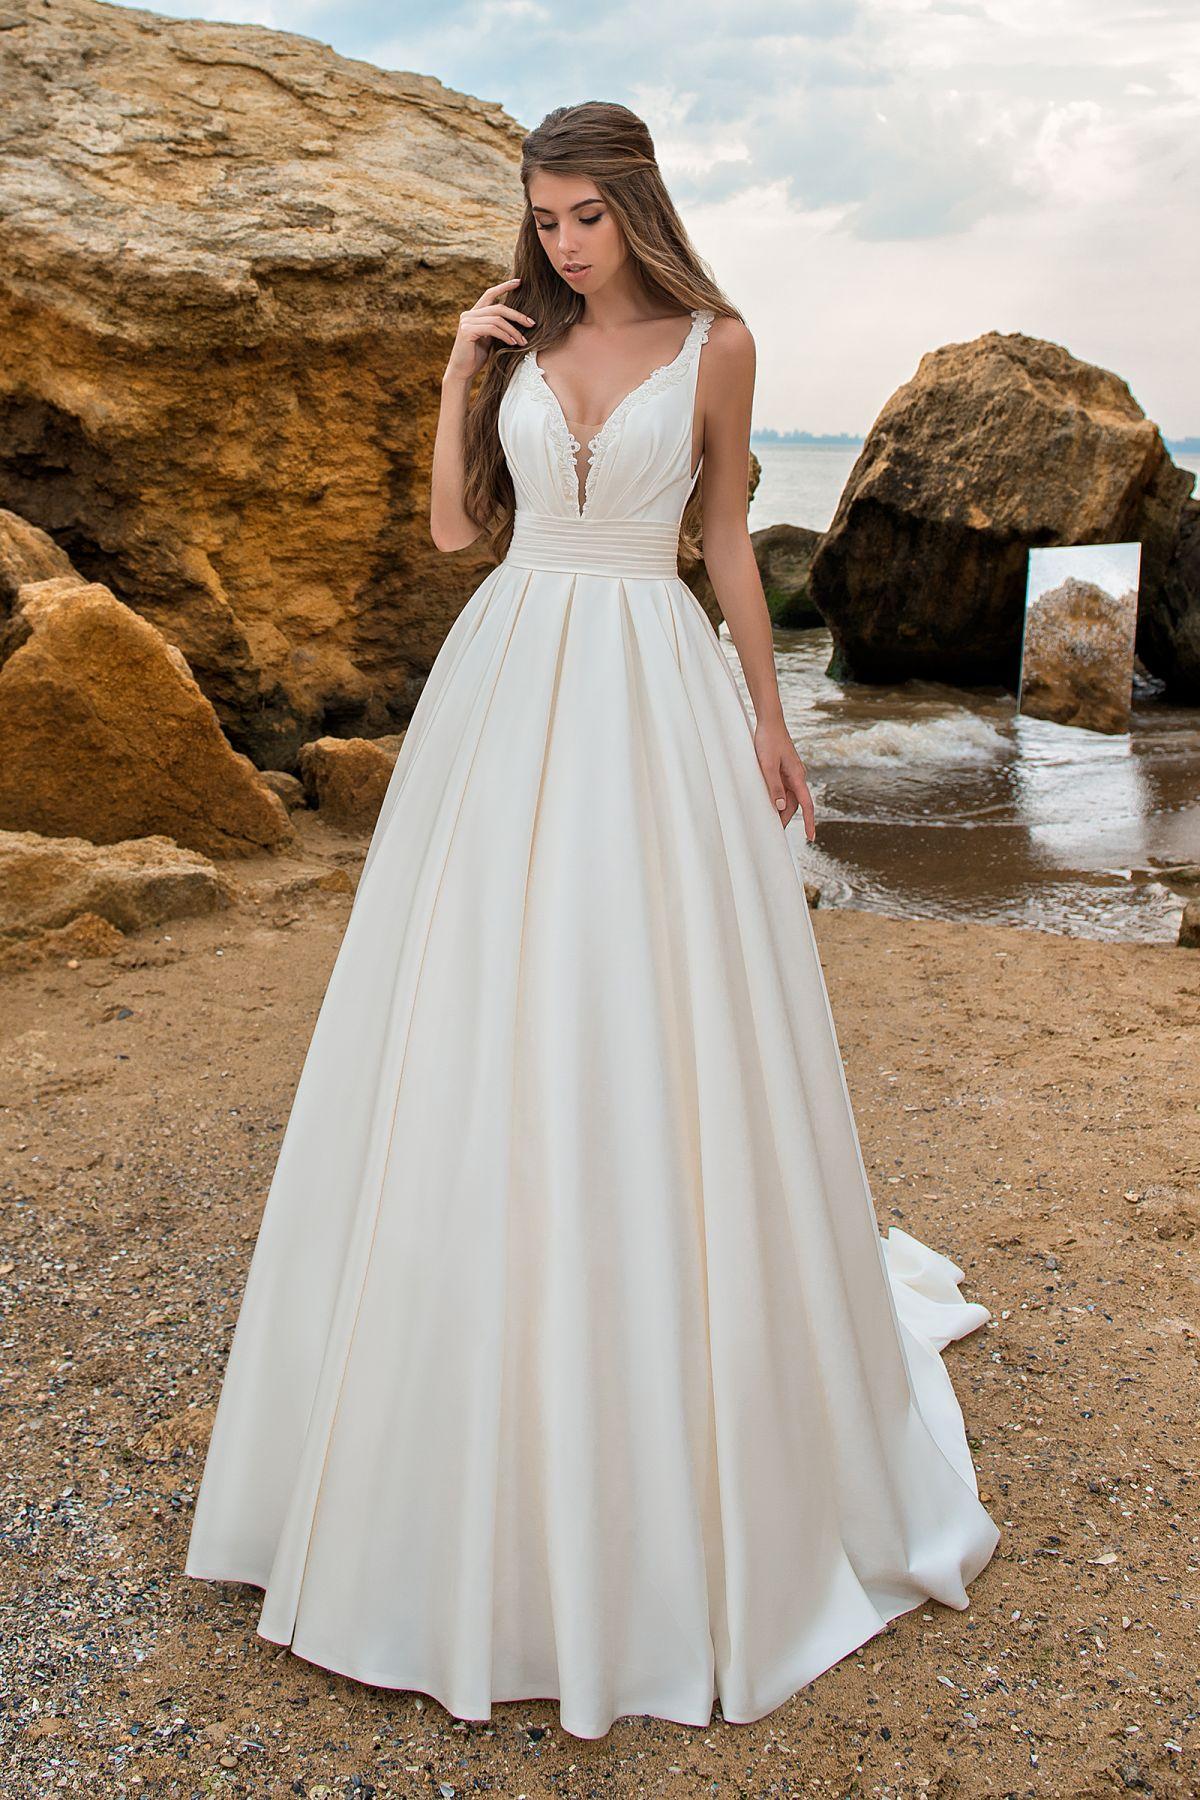 855eed537eb4 Νυφικό «Patrizia» - Νυφικά Θρησκευτικού Γάμου